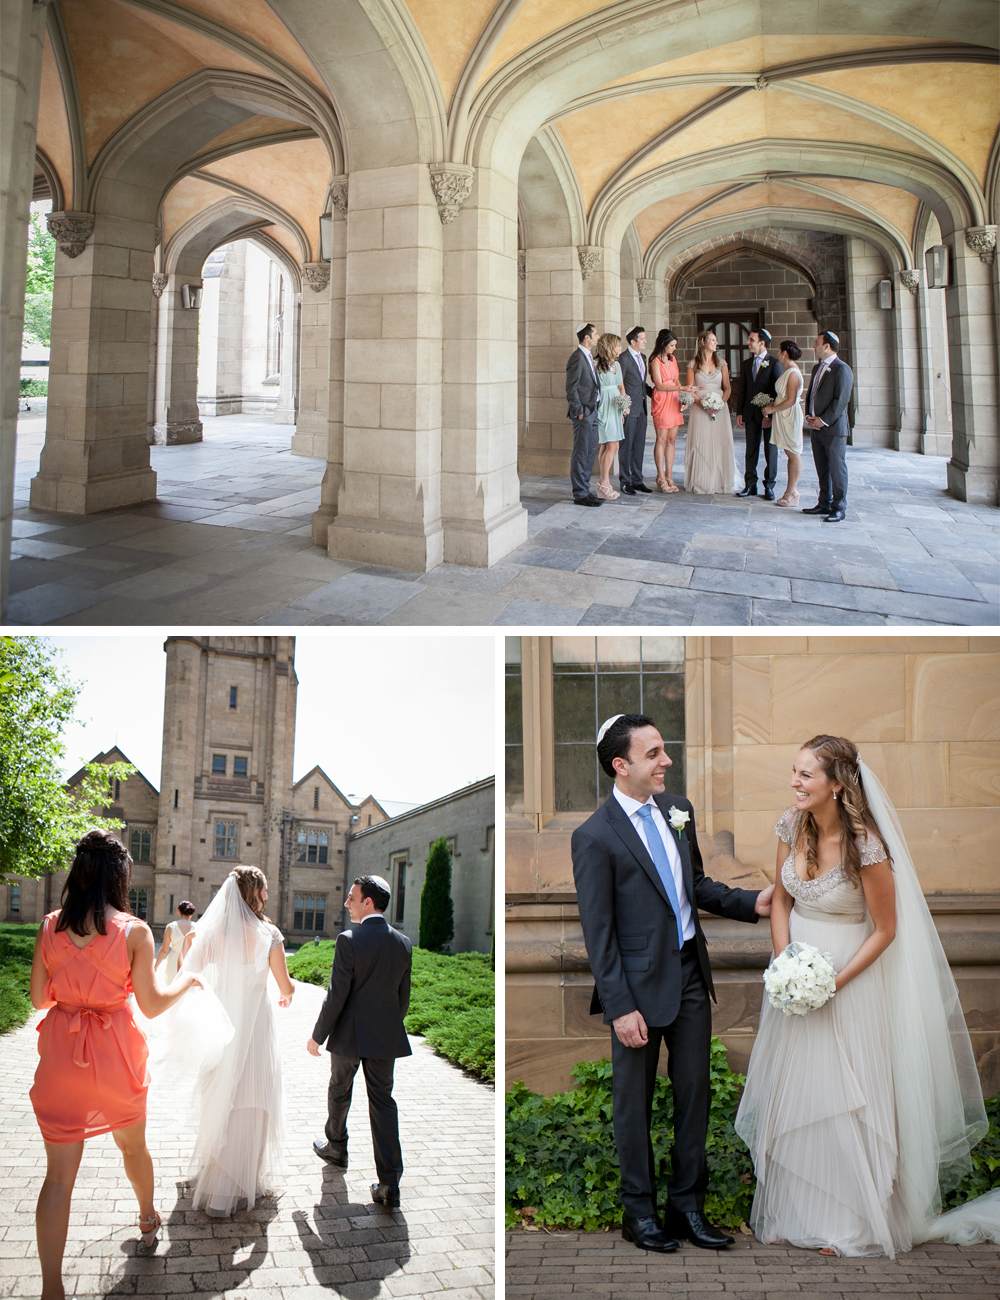 Jewish wedding Melbourne University and Luminare